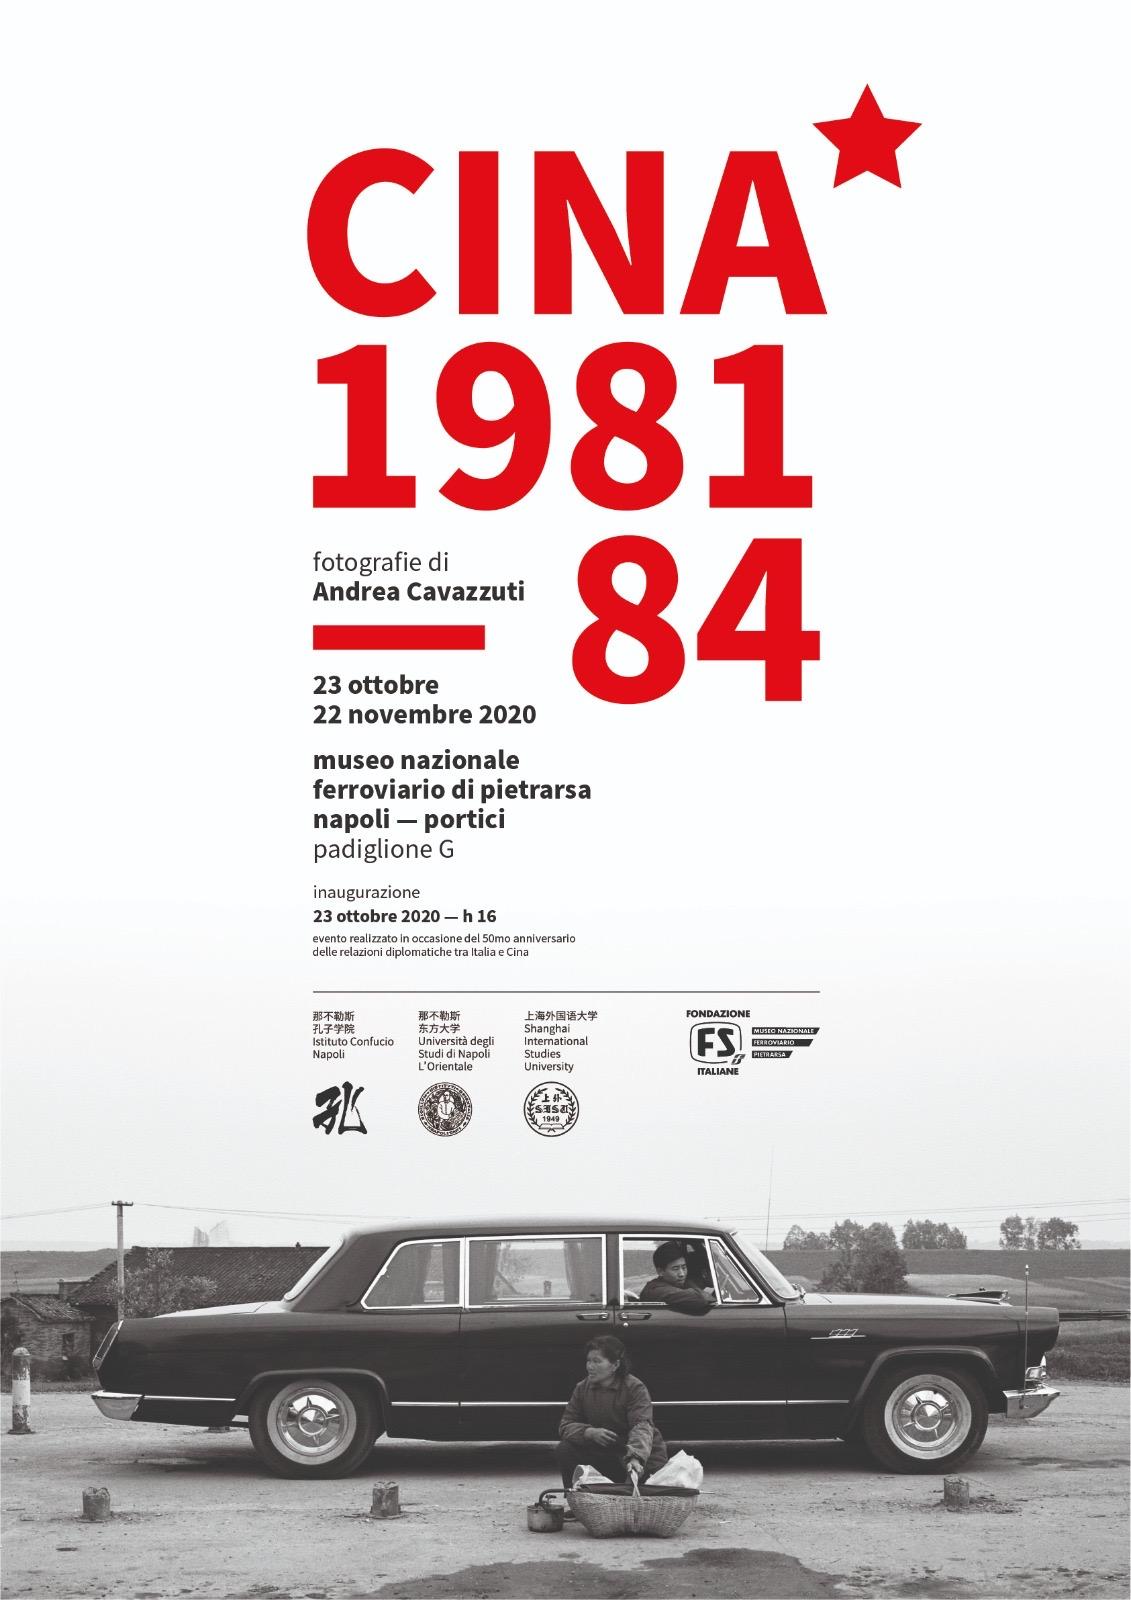 CINA 1981-84 FOTO MUSEO PIETRARSA